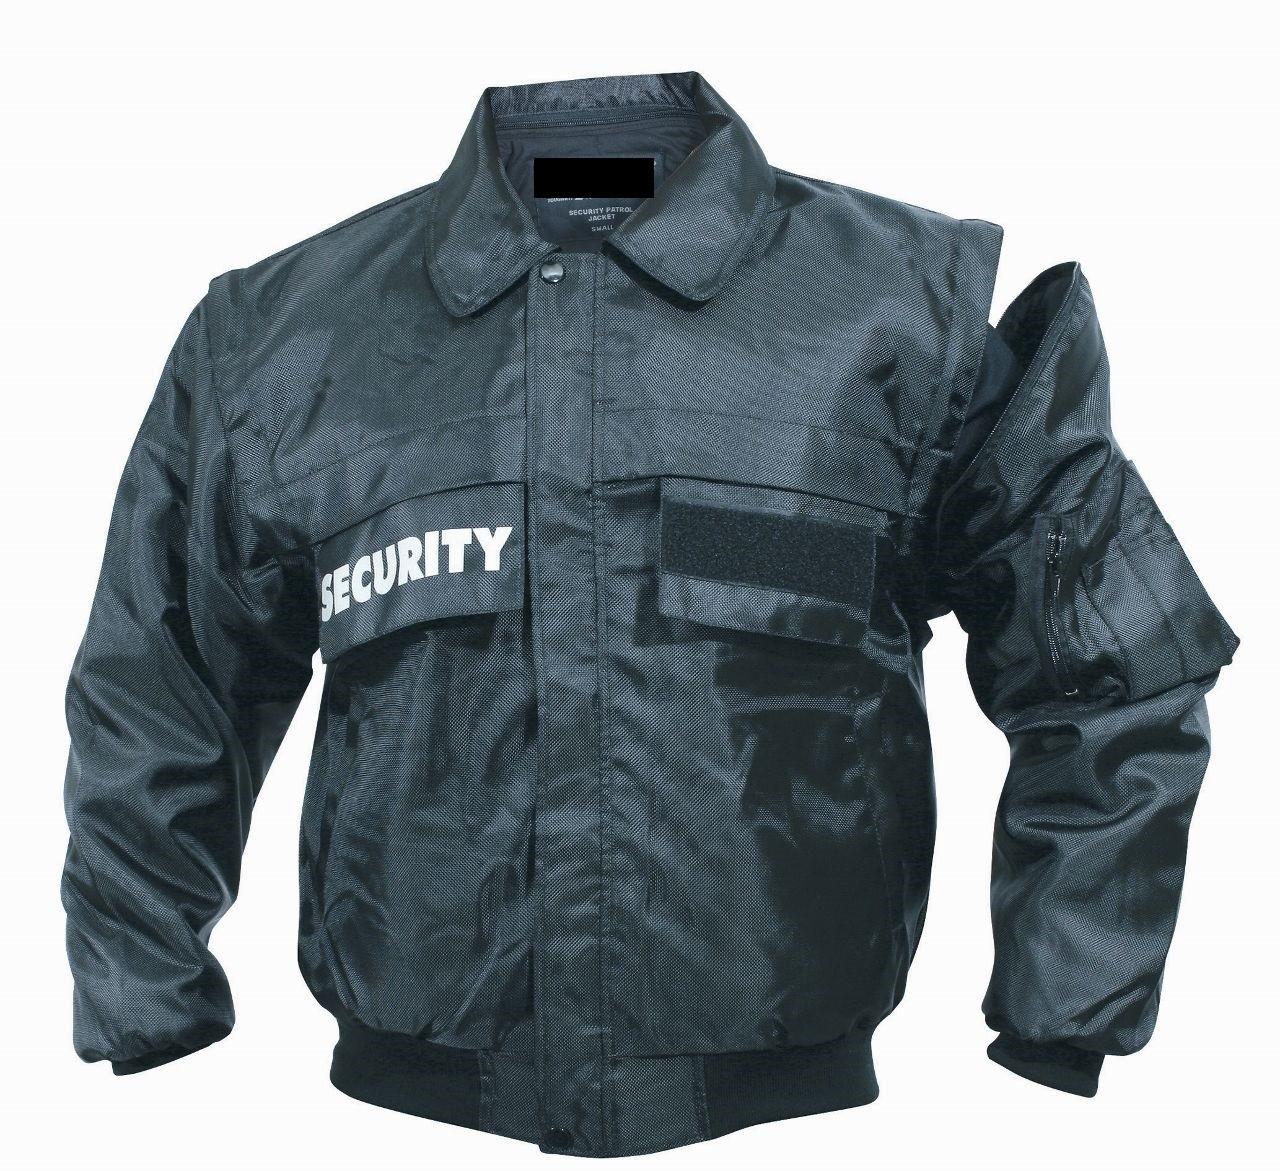 wholesale dealer d2873 03986 Giubbino Giacca Giaccone Security Vigilanza Sicurezza ...